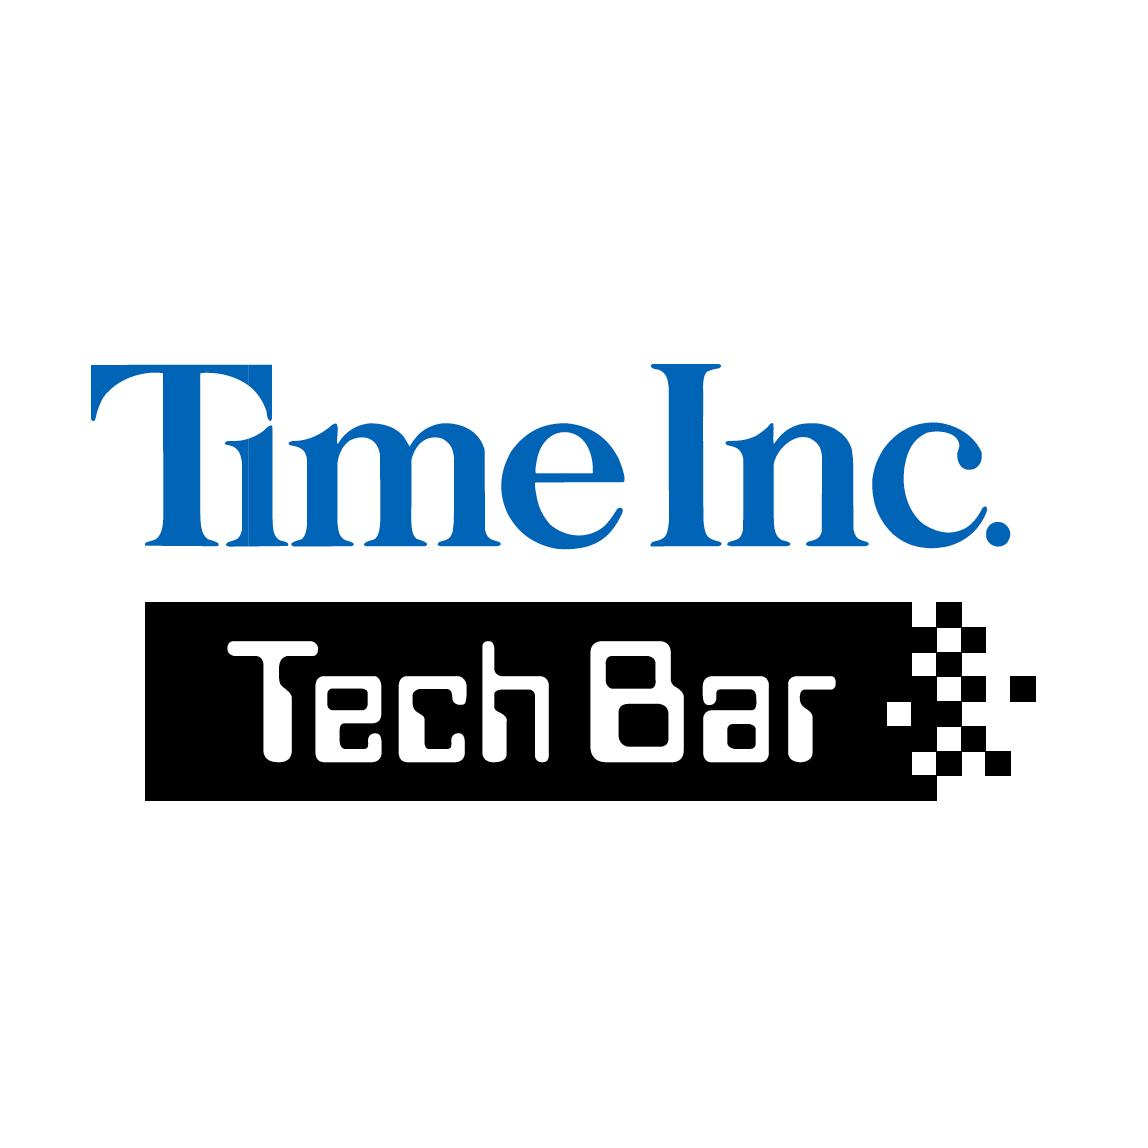 Time Inc. Tech Bar